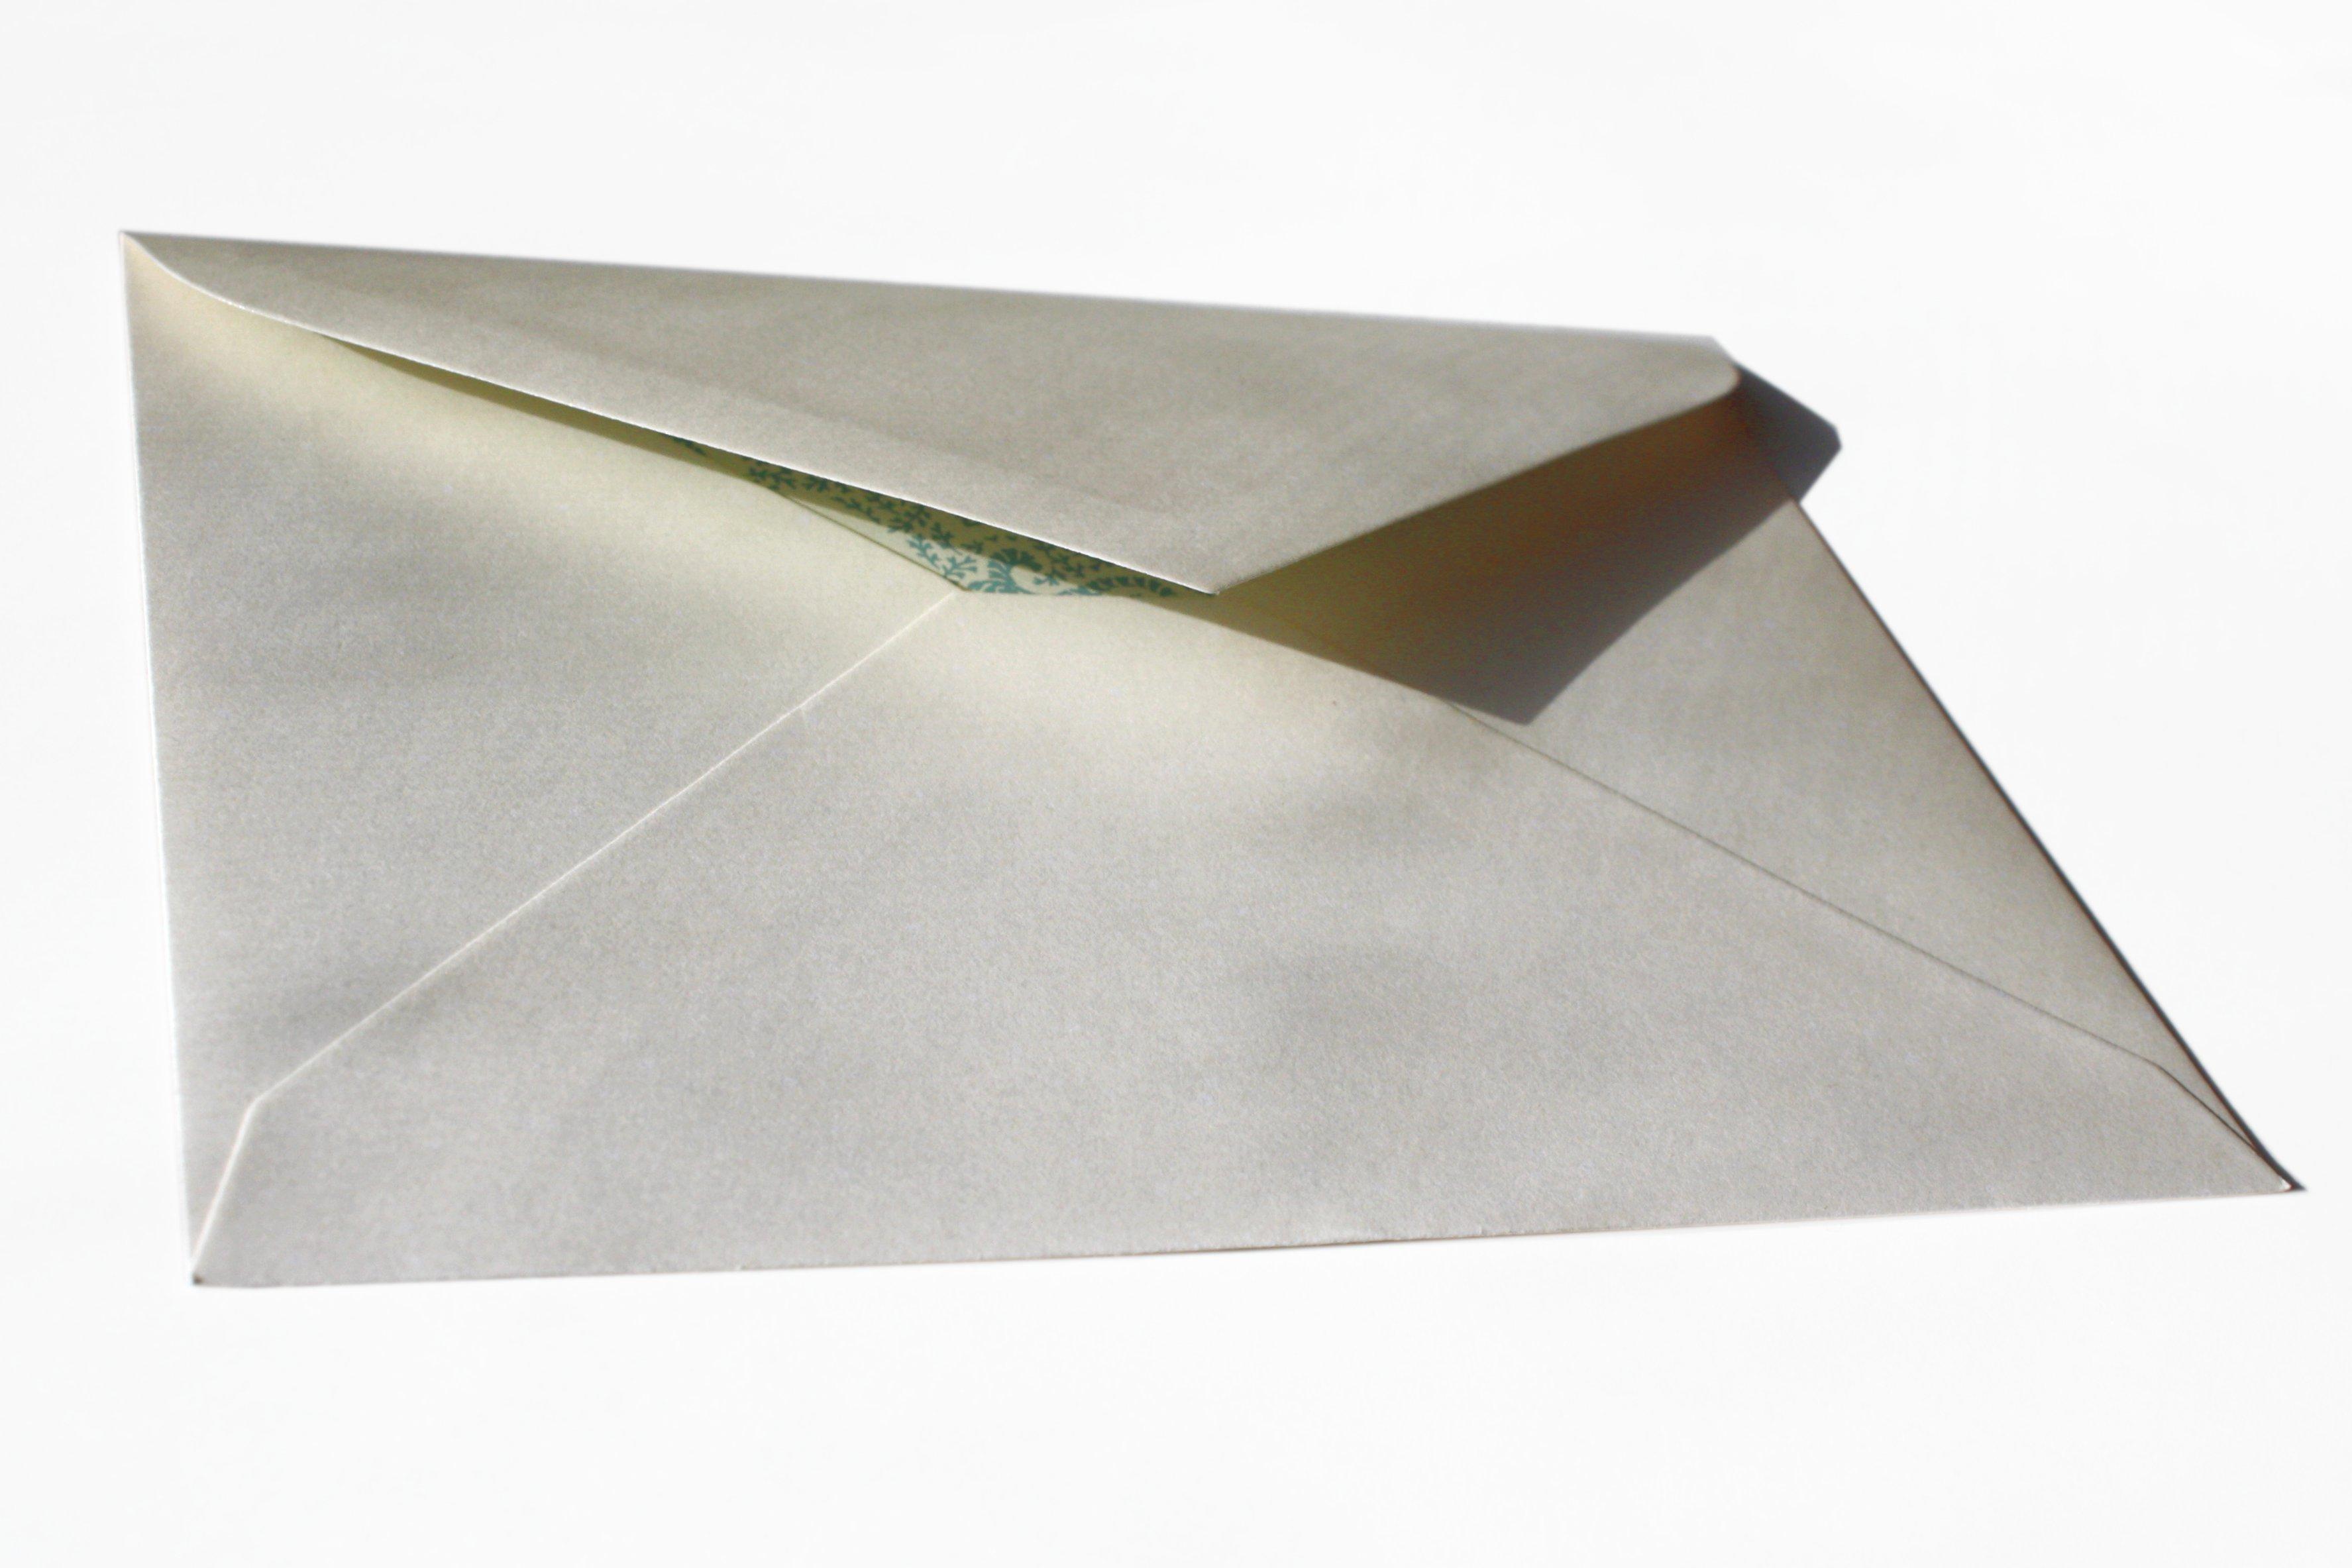 Envelope Envelope Picture Free Photograph